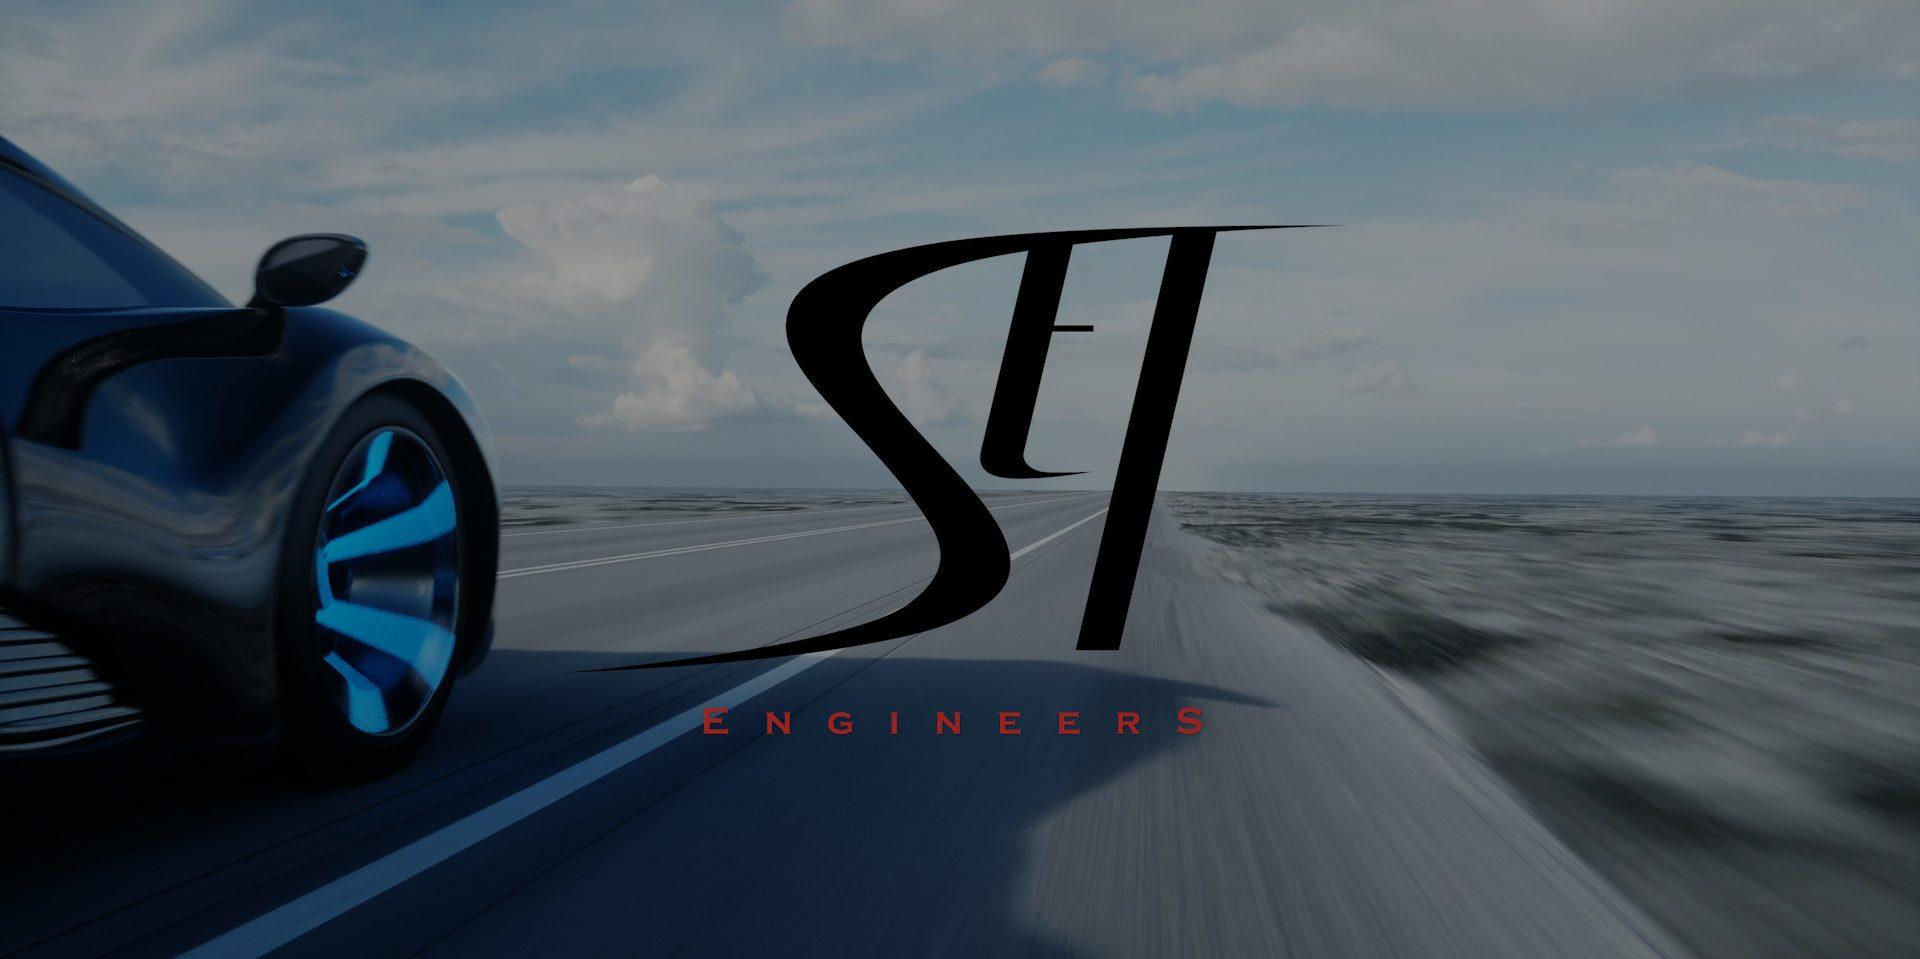 SET Engineers